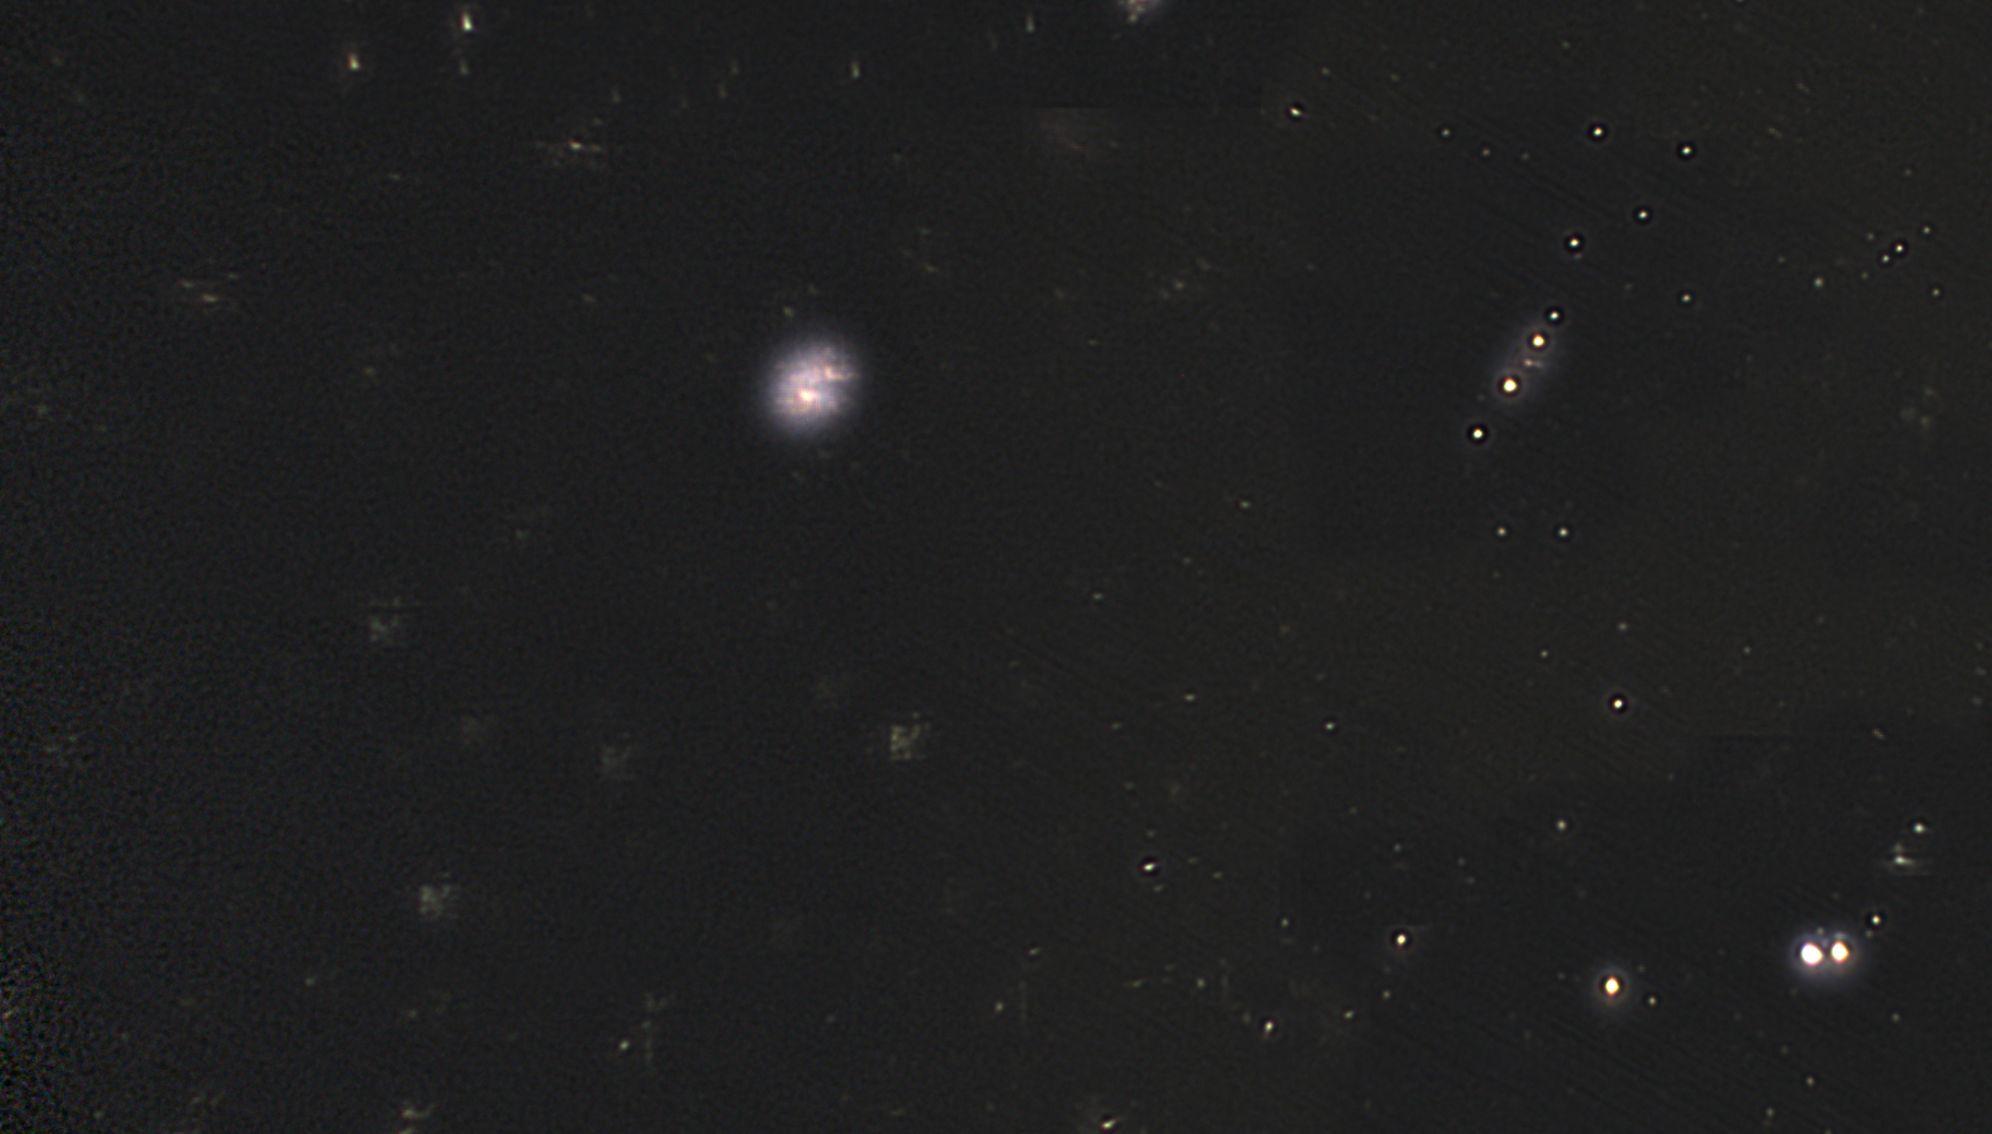 large.2018-05-08-00-52-59_lapl4_ap7444.jpg.47a9cc4b80d7a3729aa528dcb88d09ce.jpg